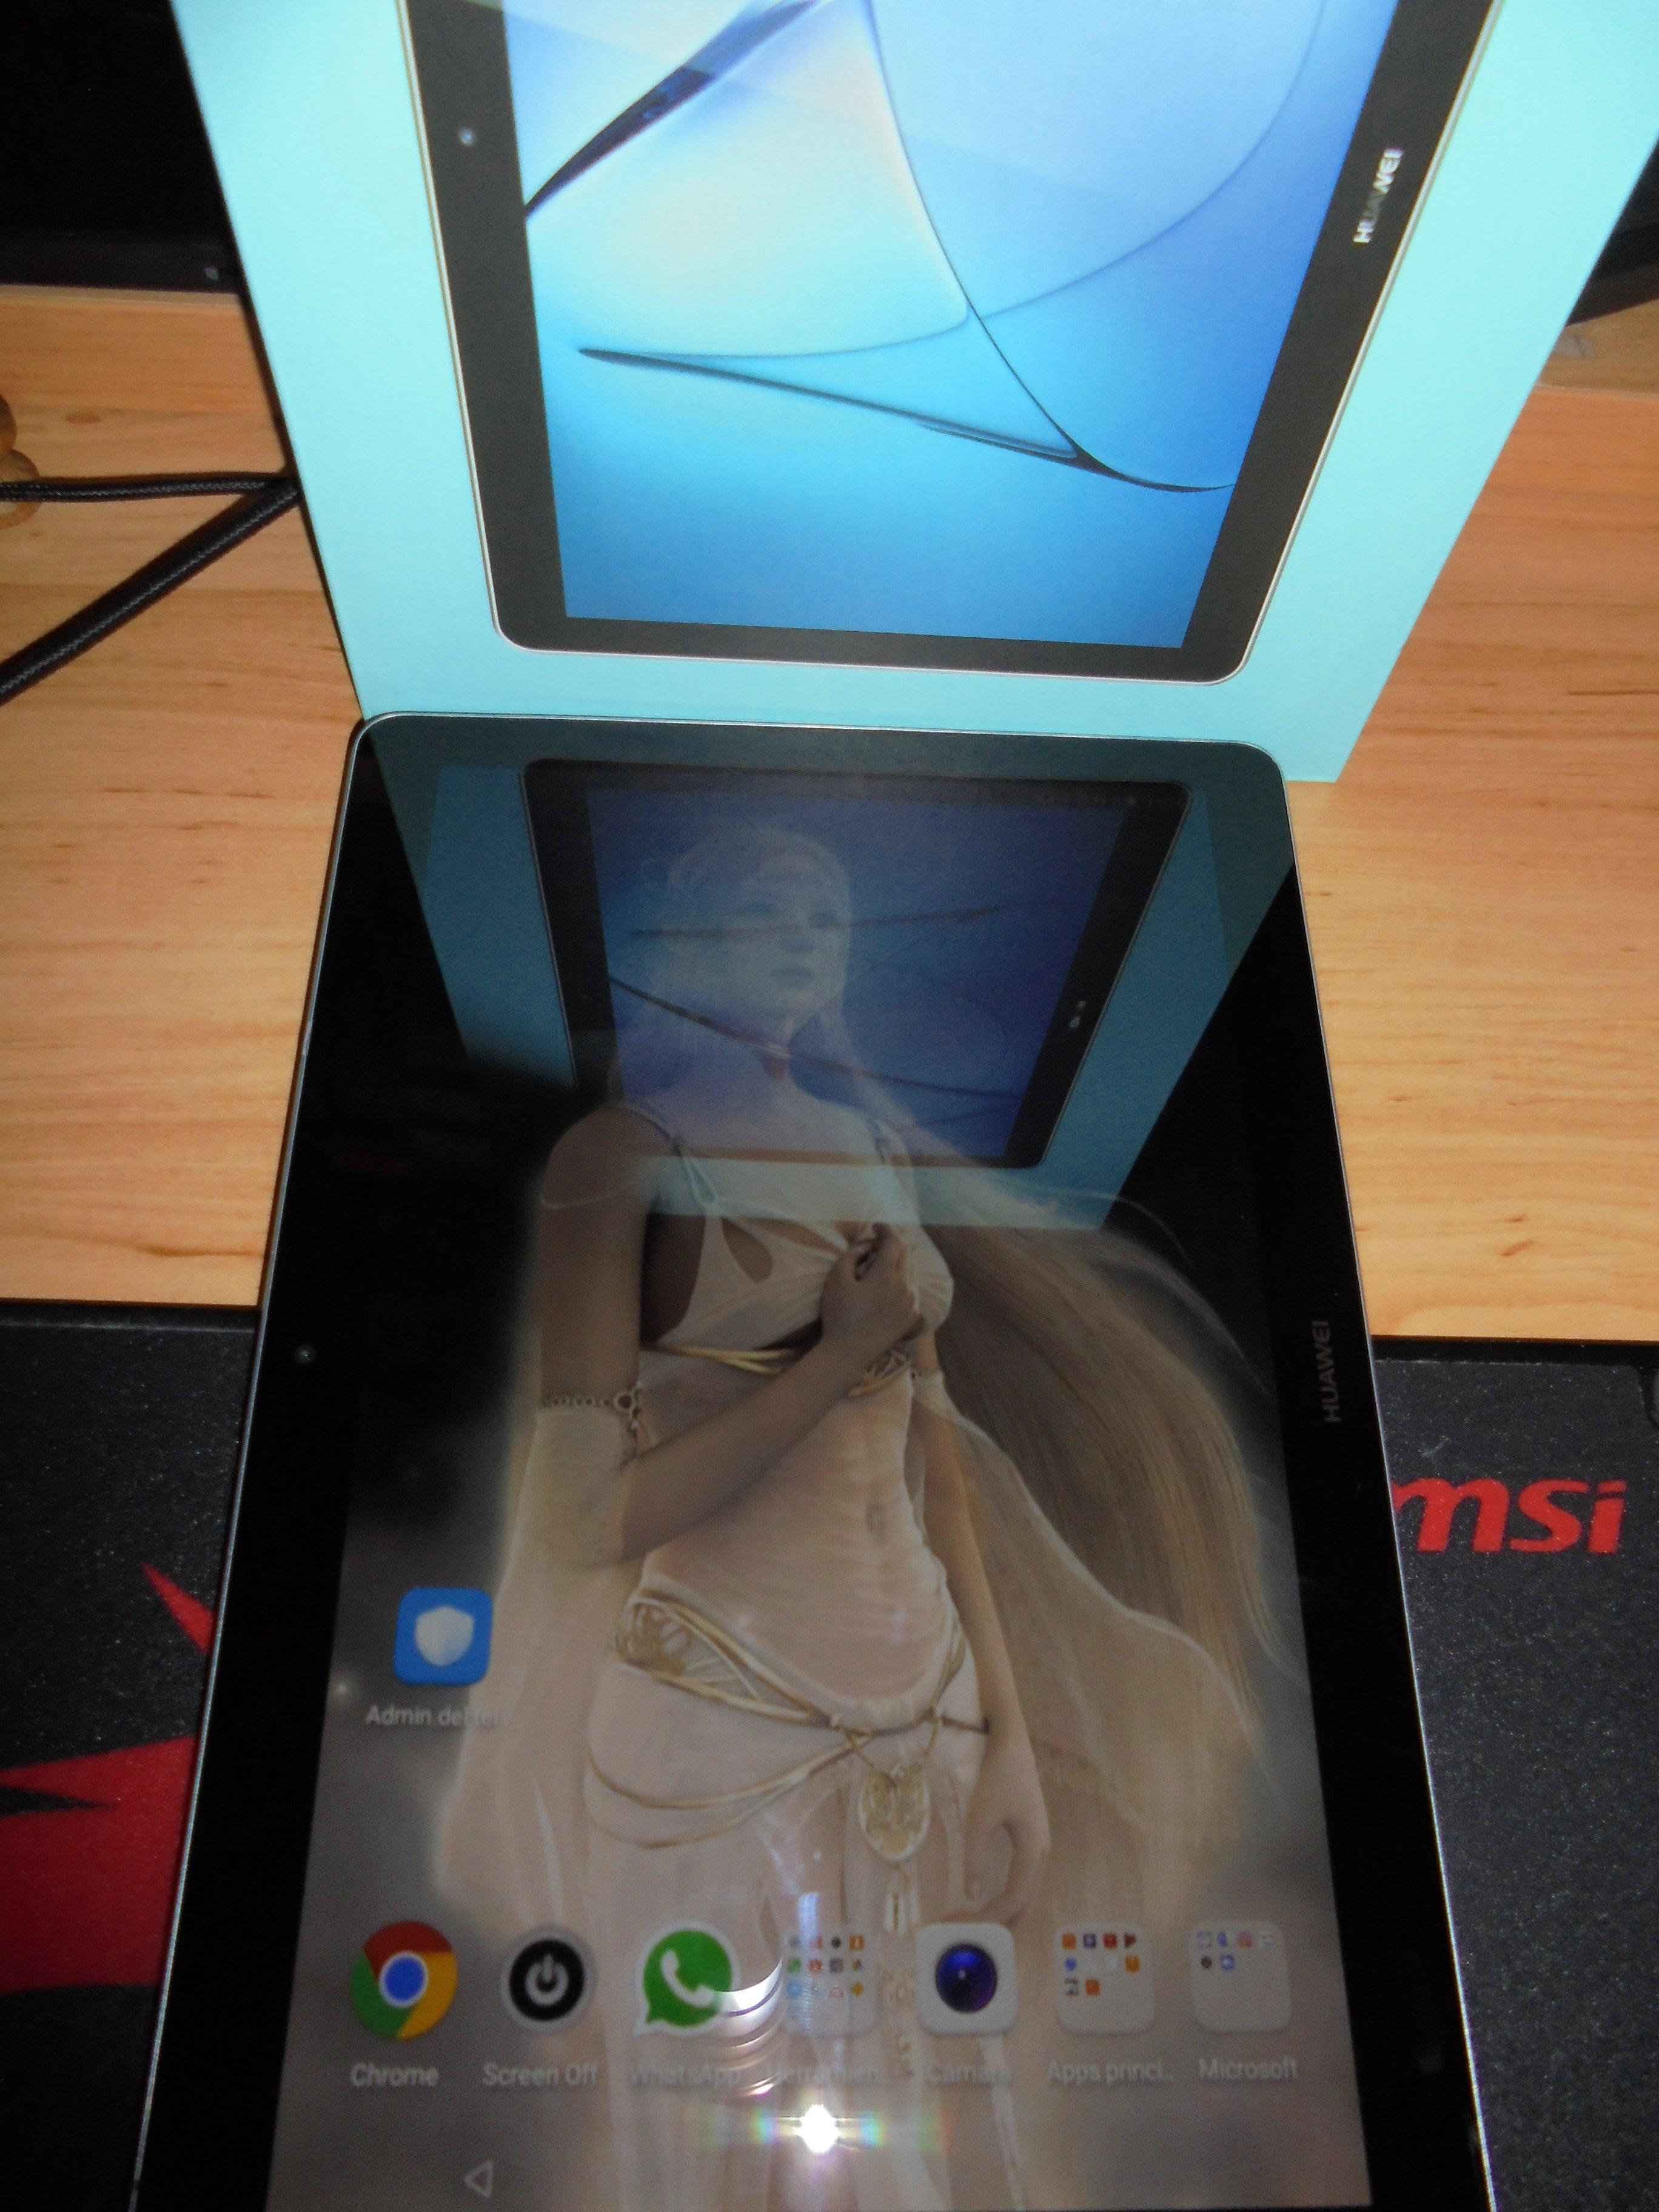 [VENDIDO] Huawei mediapad T3 10